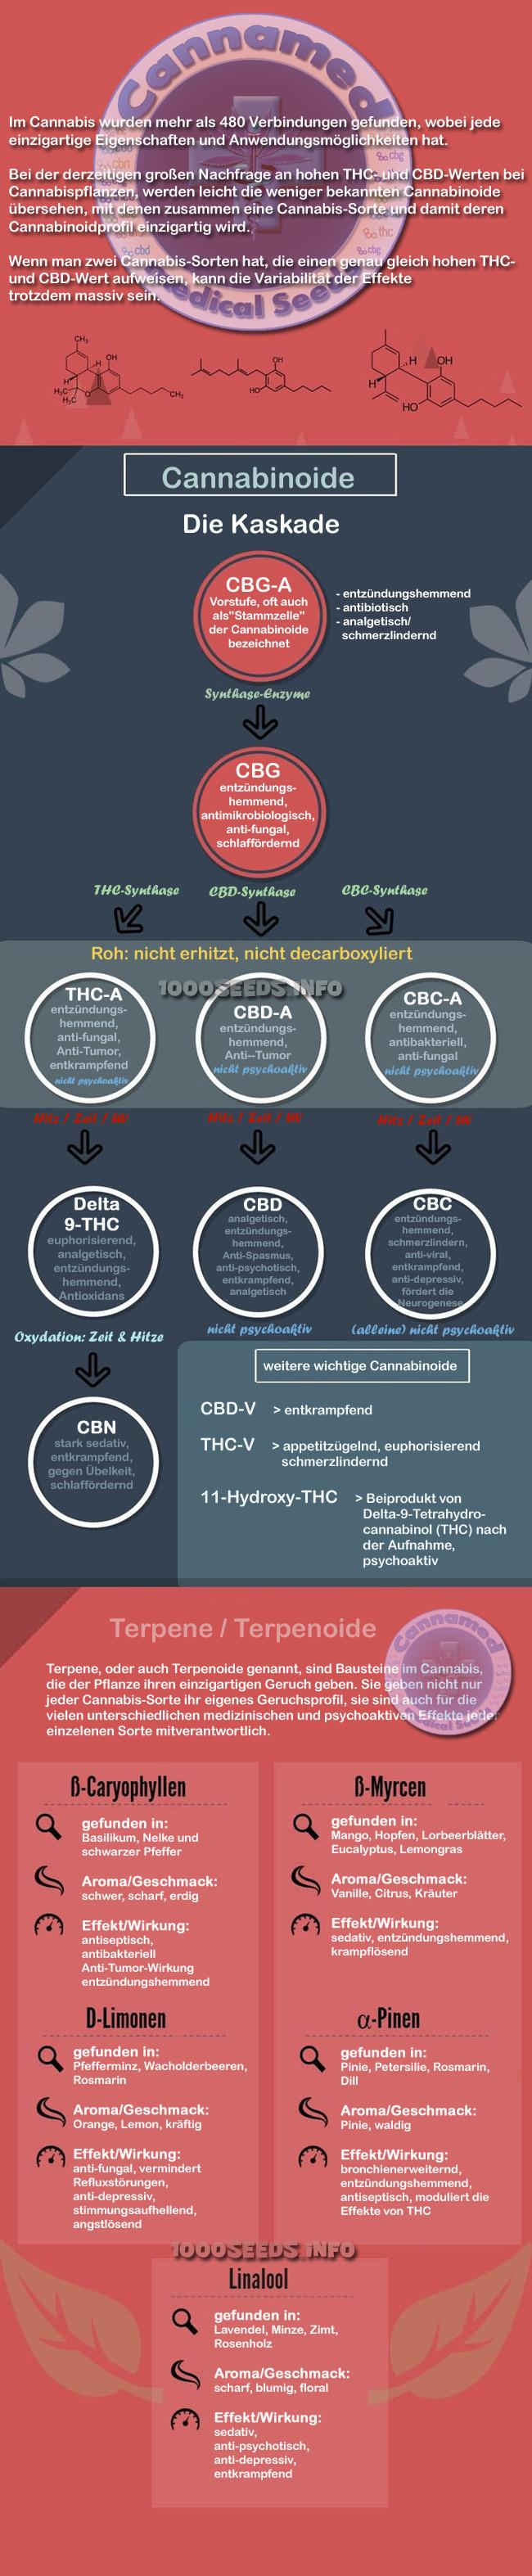 Cannabinoid-Kaskade